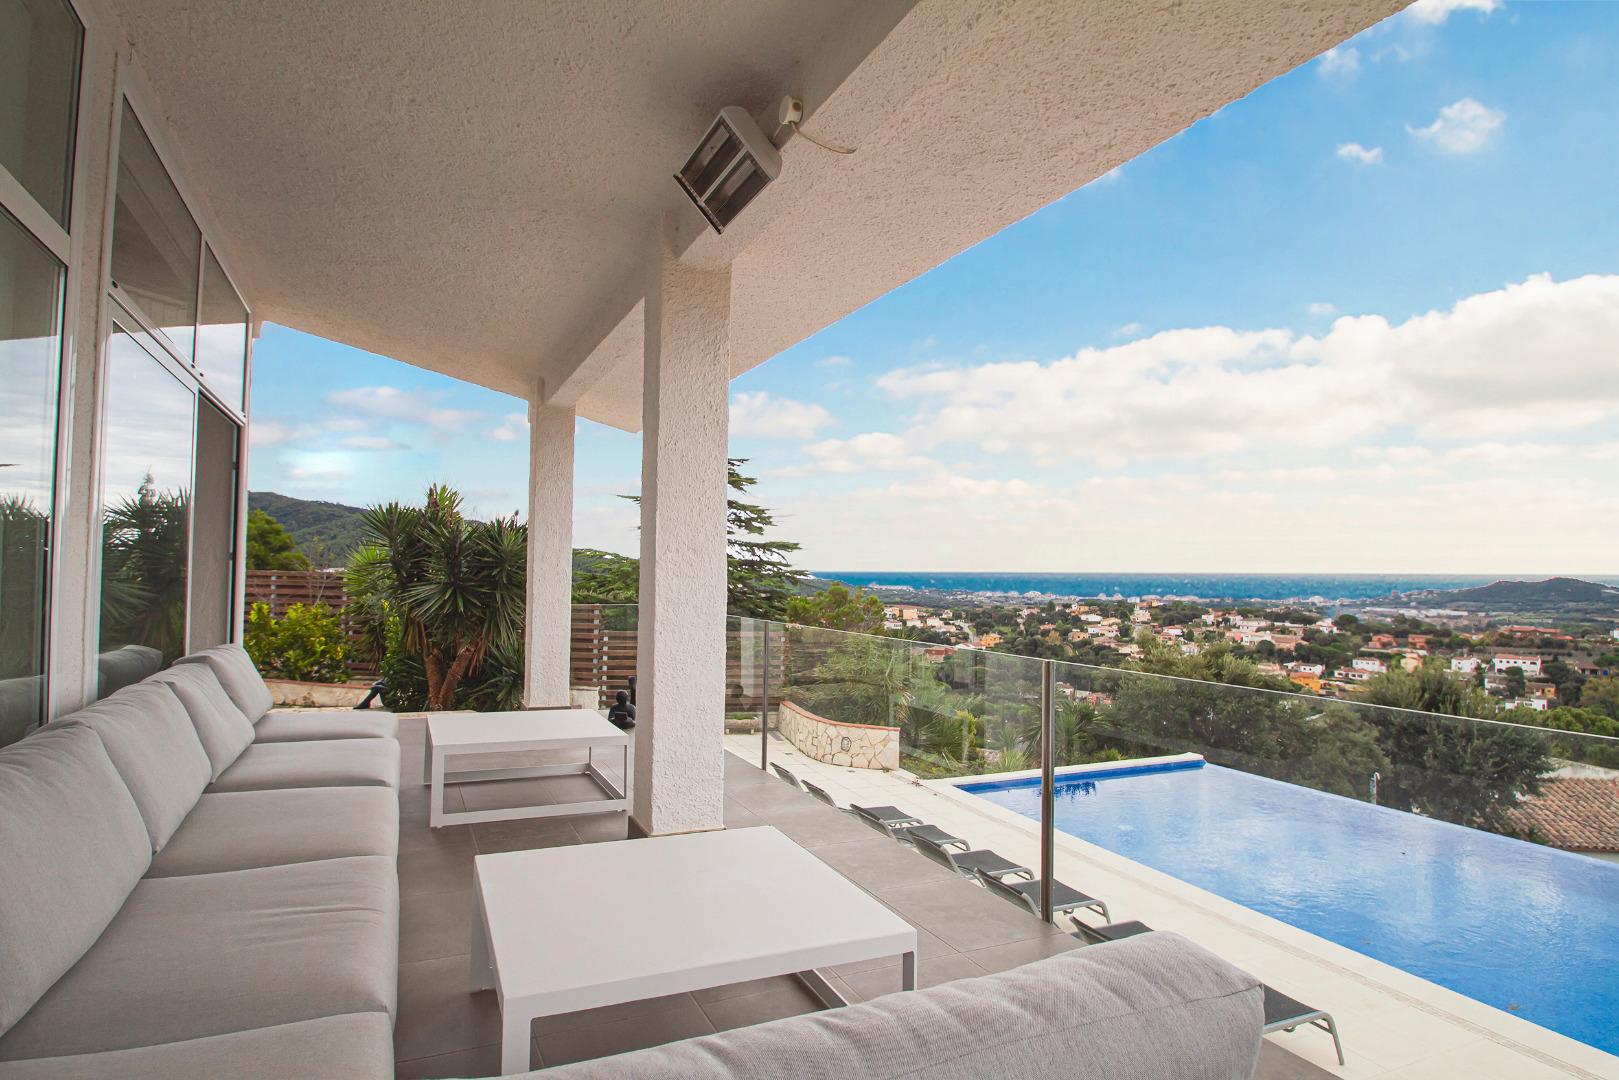 Villa Monnee,Calonge,Costa Brava #1